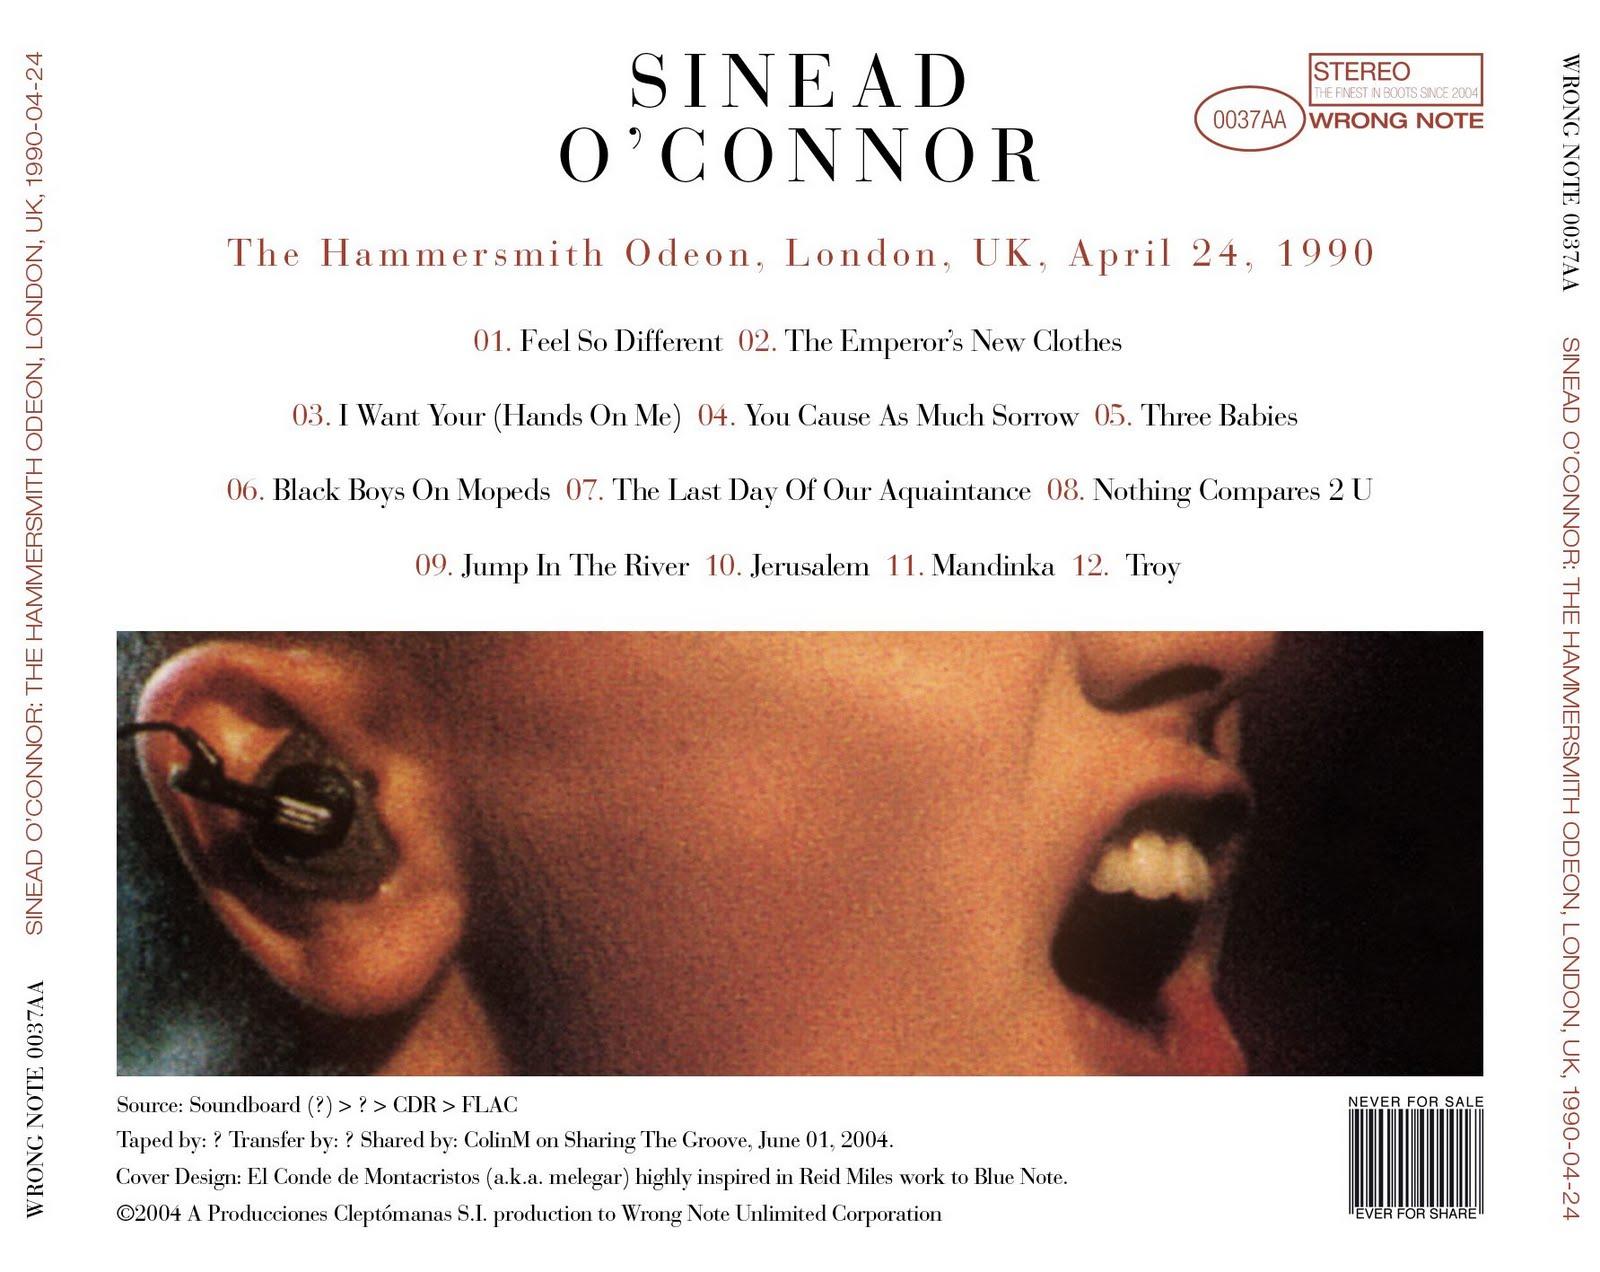 http://2.bp.blogspot.com/_rB7DadgtLuM/Sw84ZTJnXpI/AAAAAAAAAQA/Svq1Gdd2wzY/s1600/The+Hammersmith+Odeon,+London,+UK+(April+24,+1990)_back.jpg